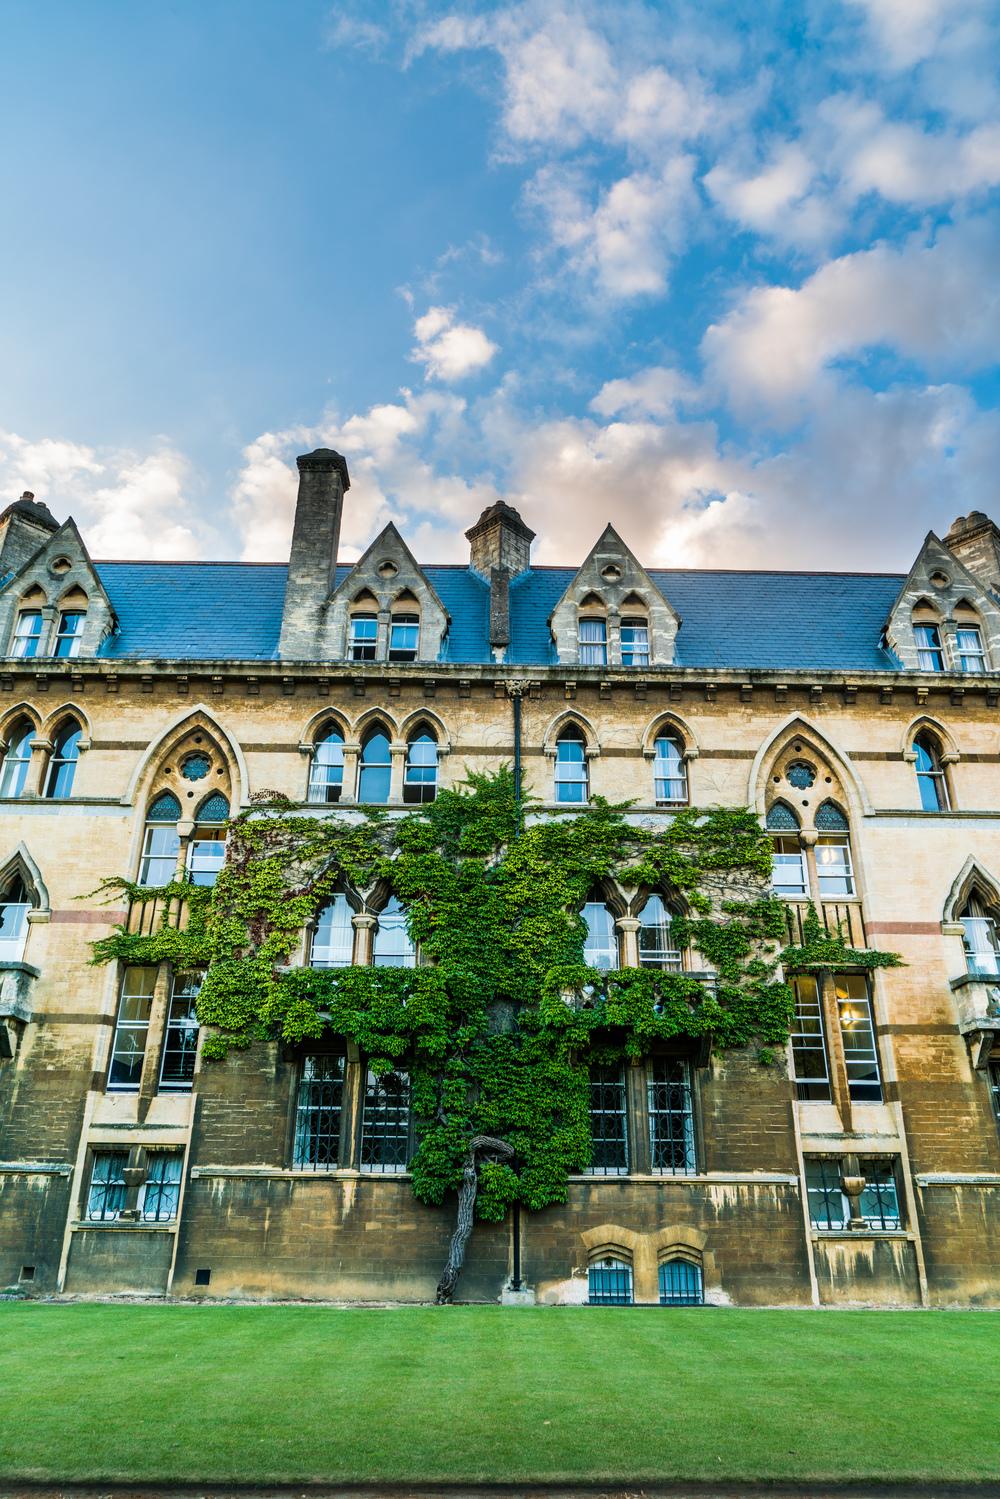 Christ Church College, Oxford, England, UK